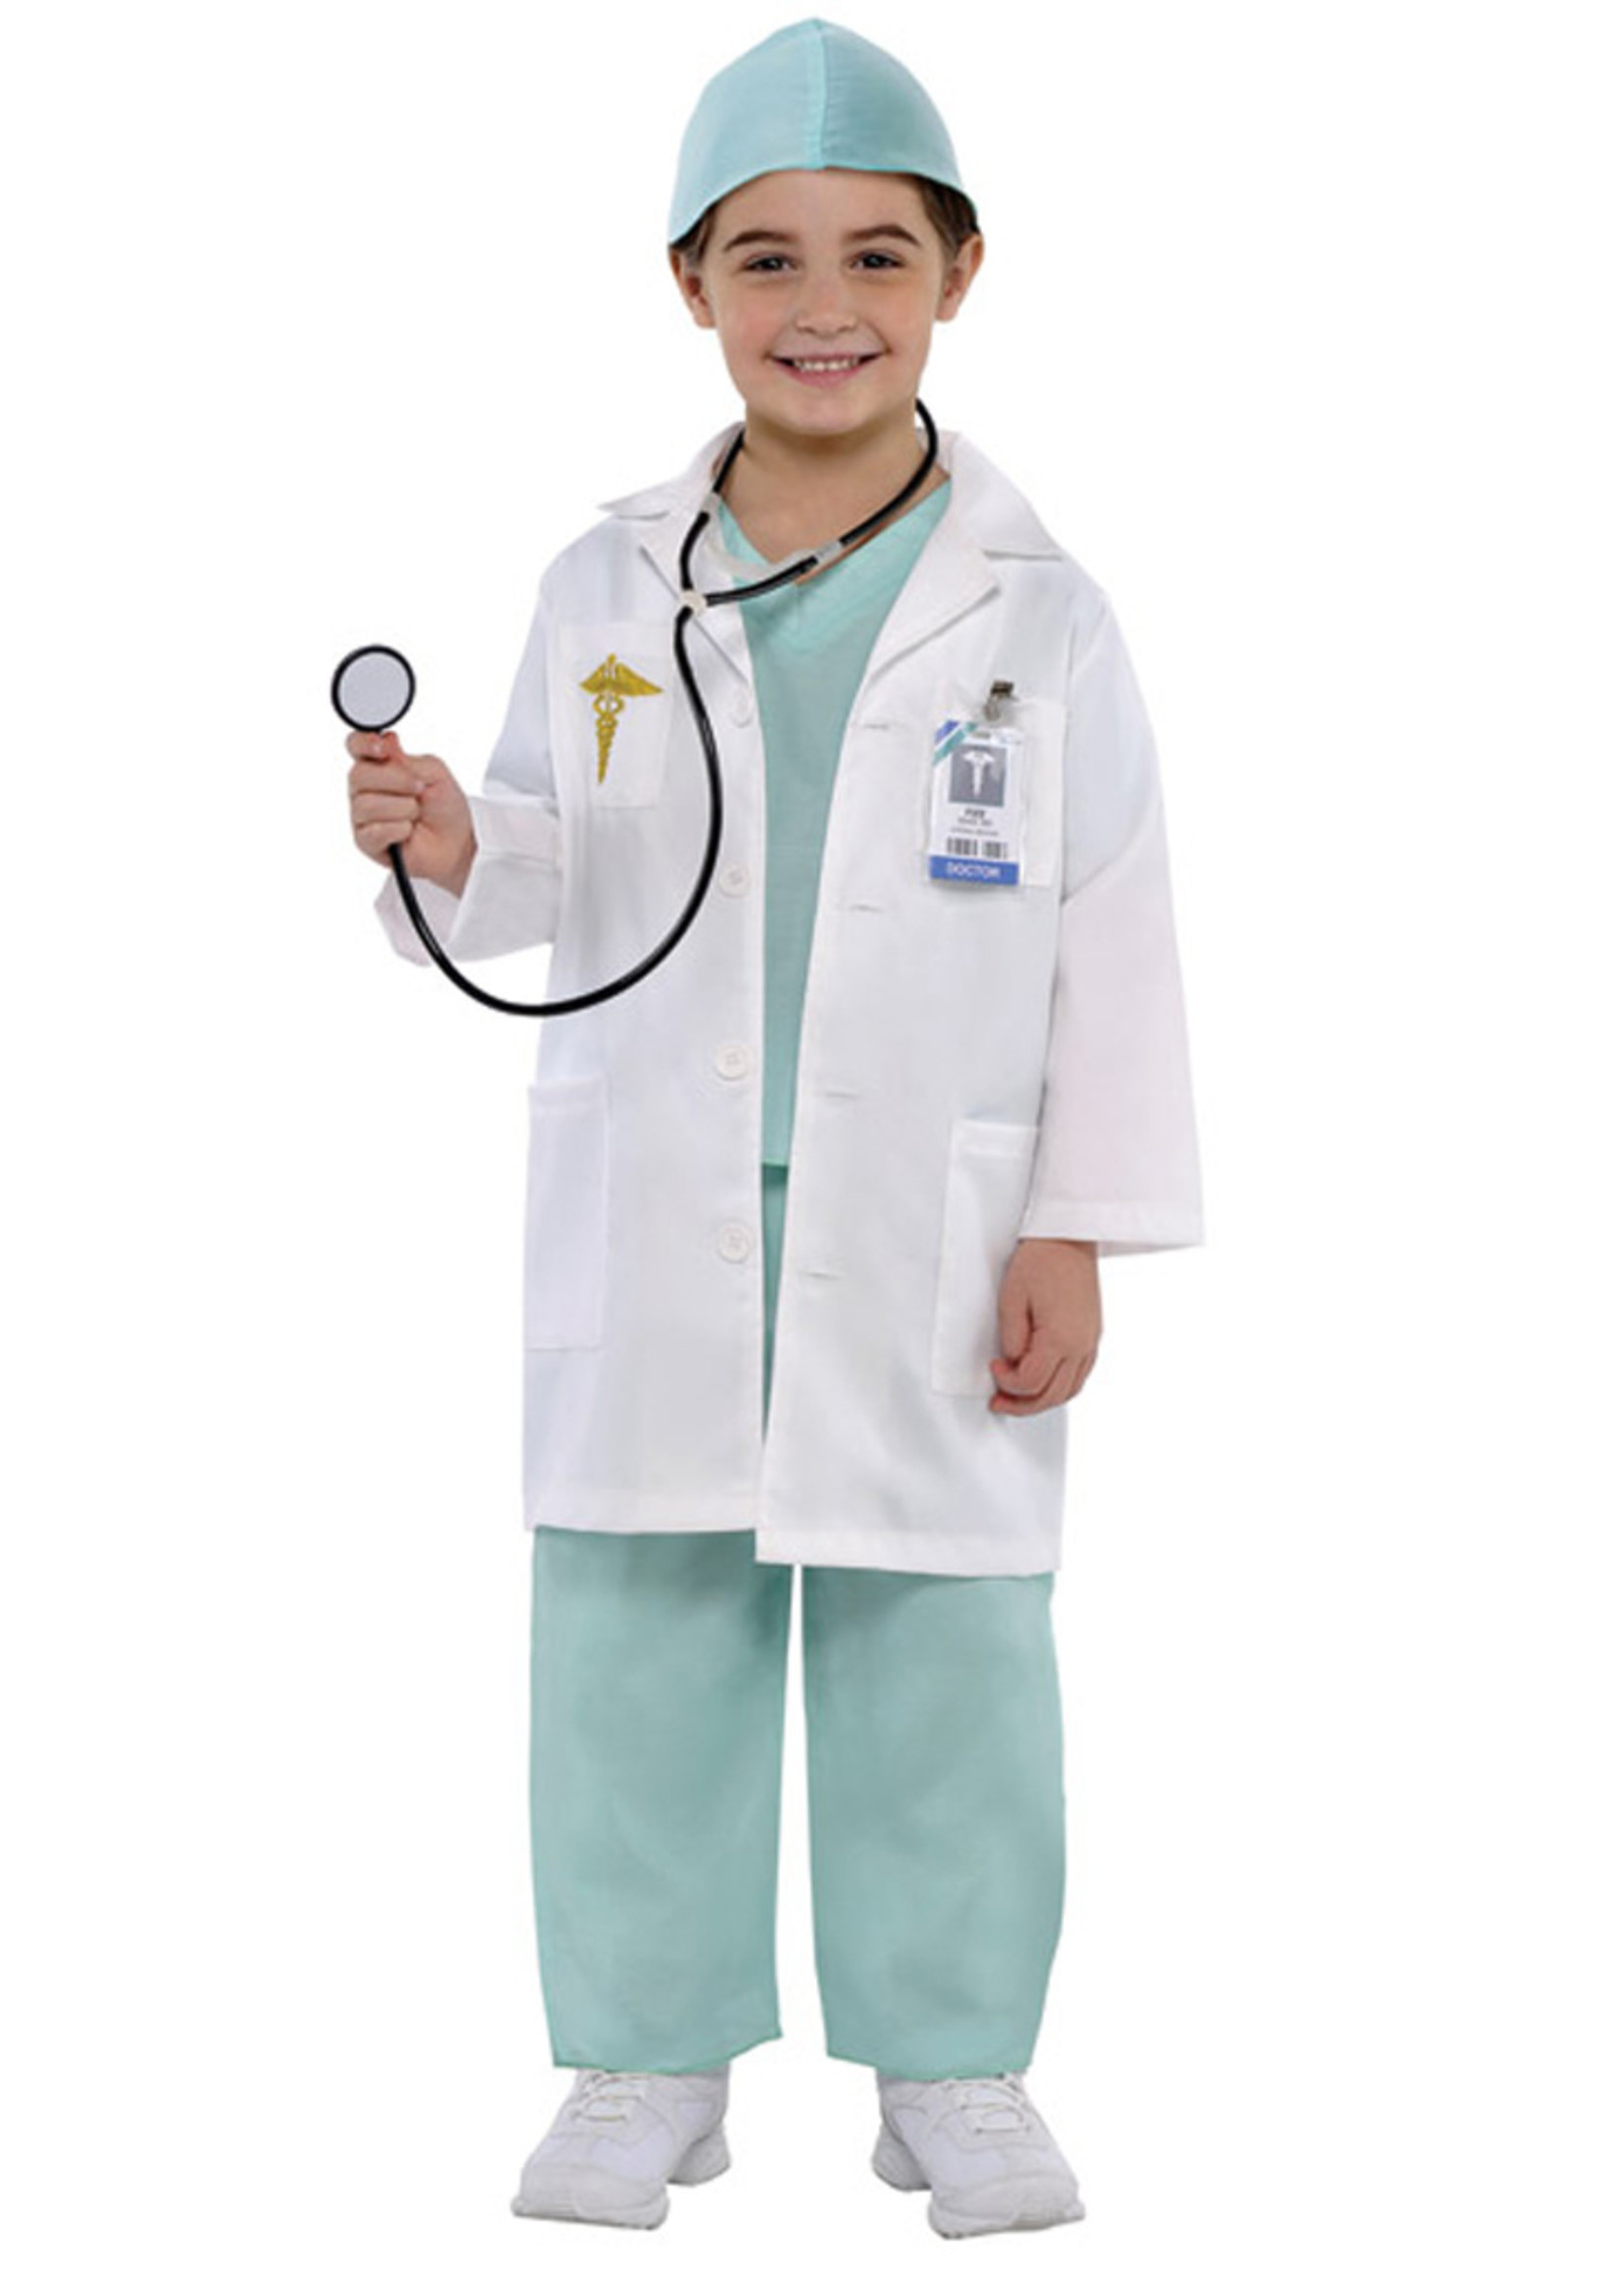 Doctor Costume - Boys